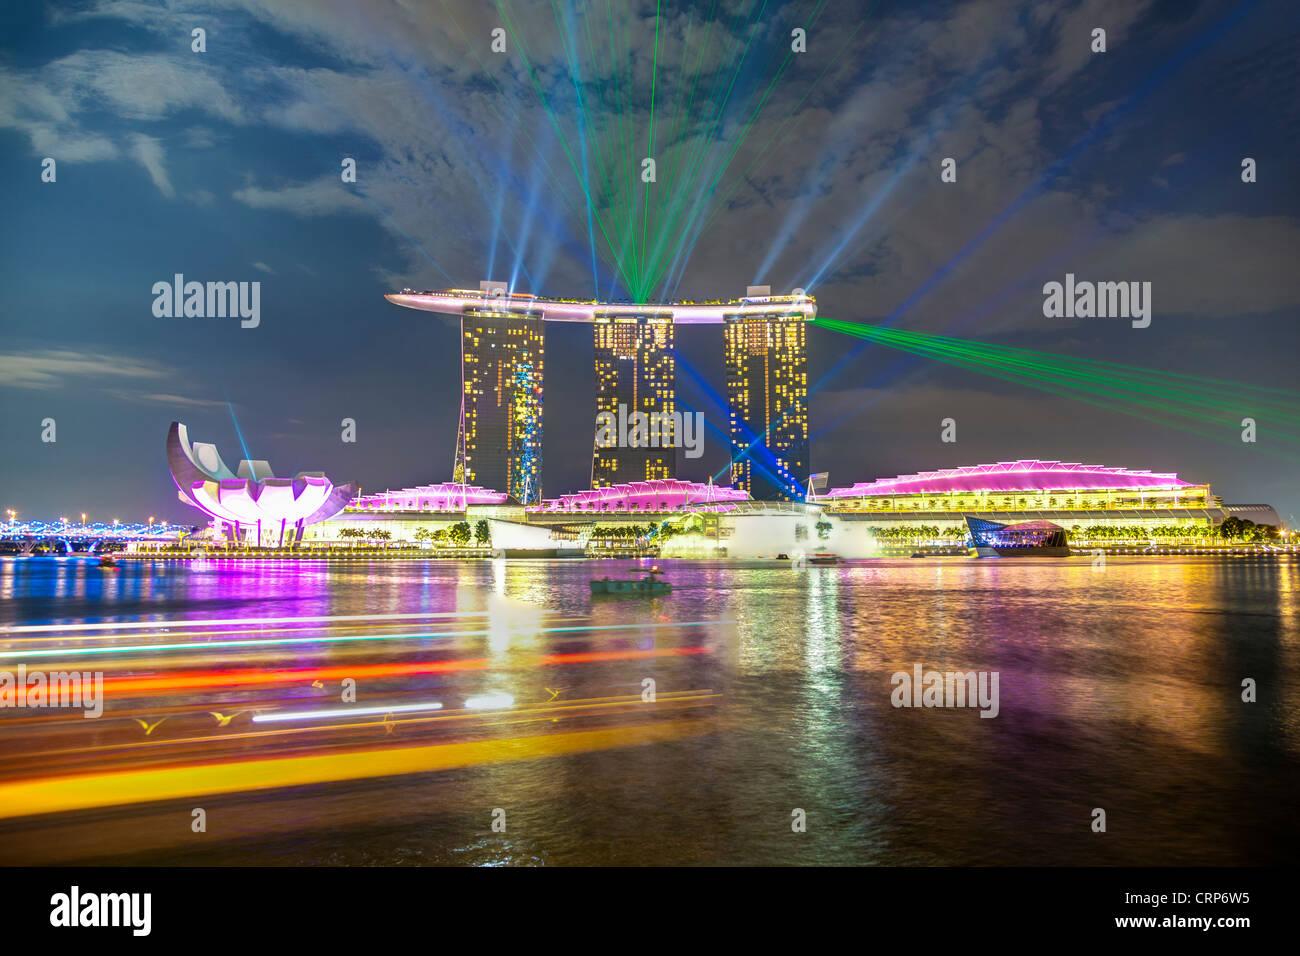 Marina Bay Sands, Marina Bay, Singapore, South East Asia - Stock Image